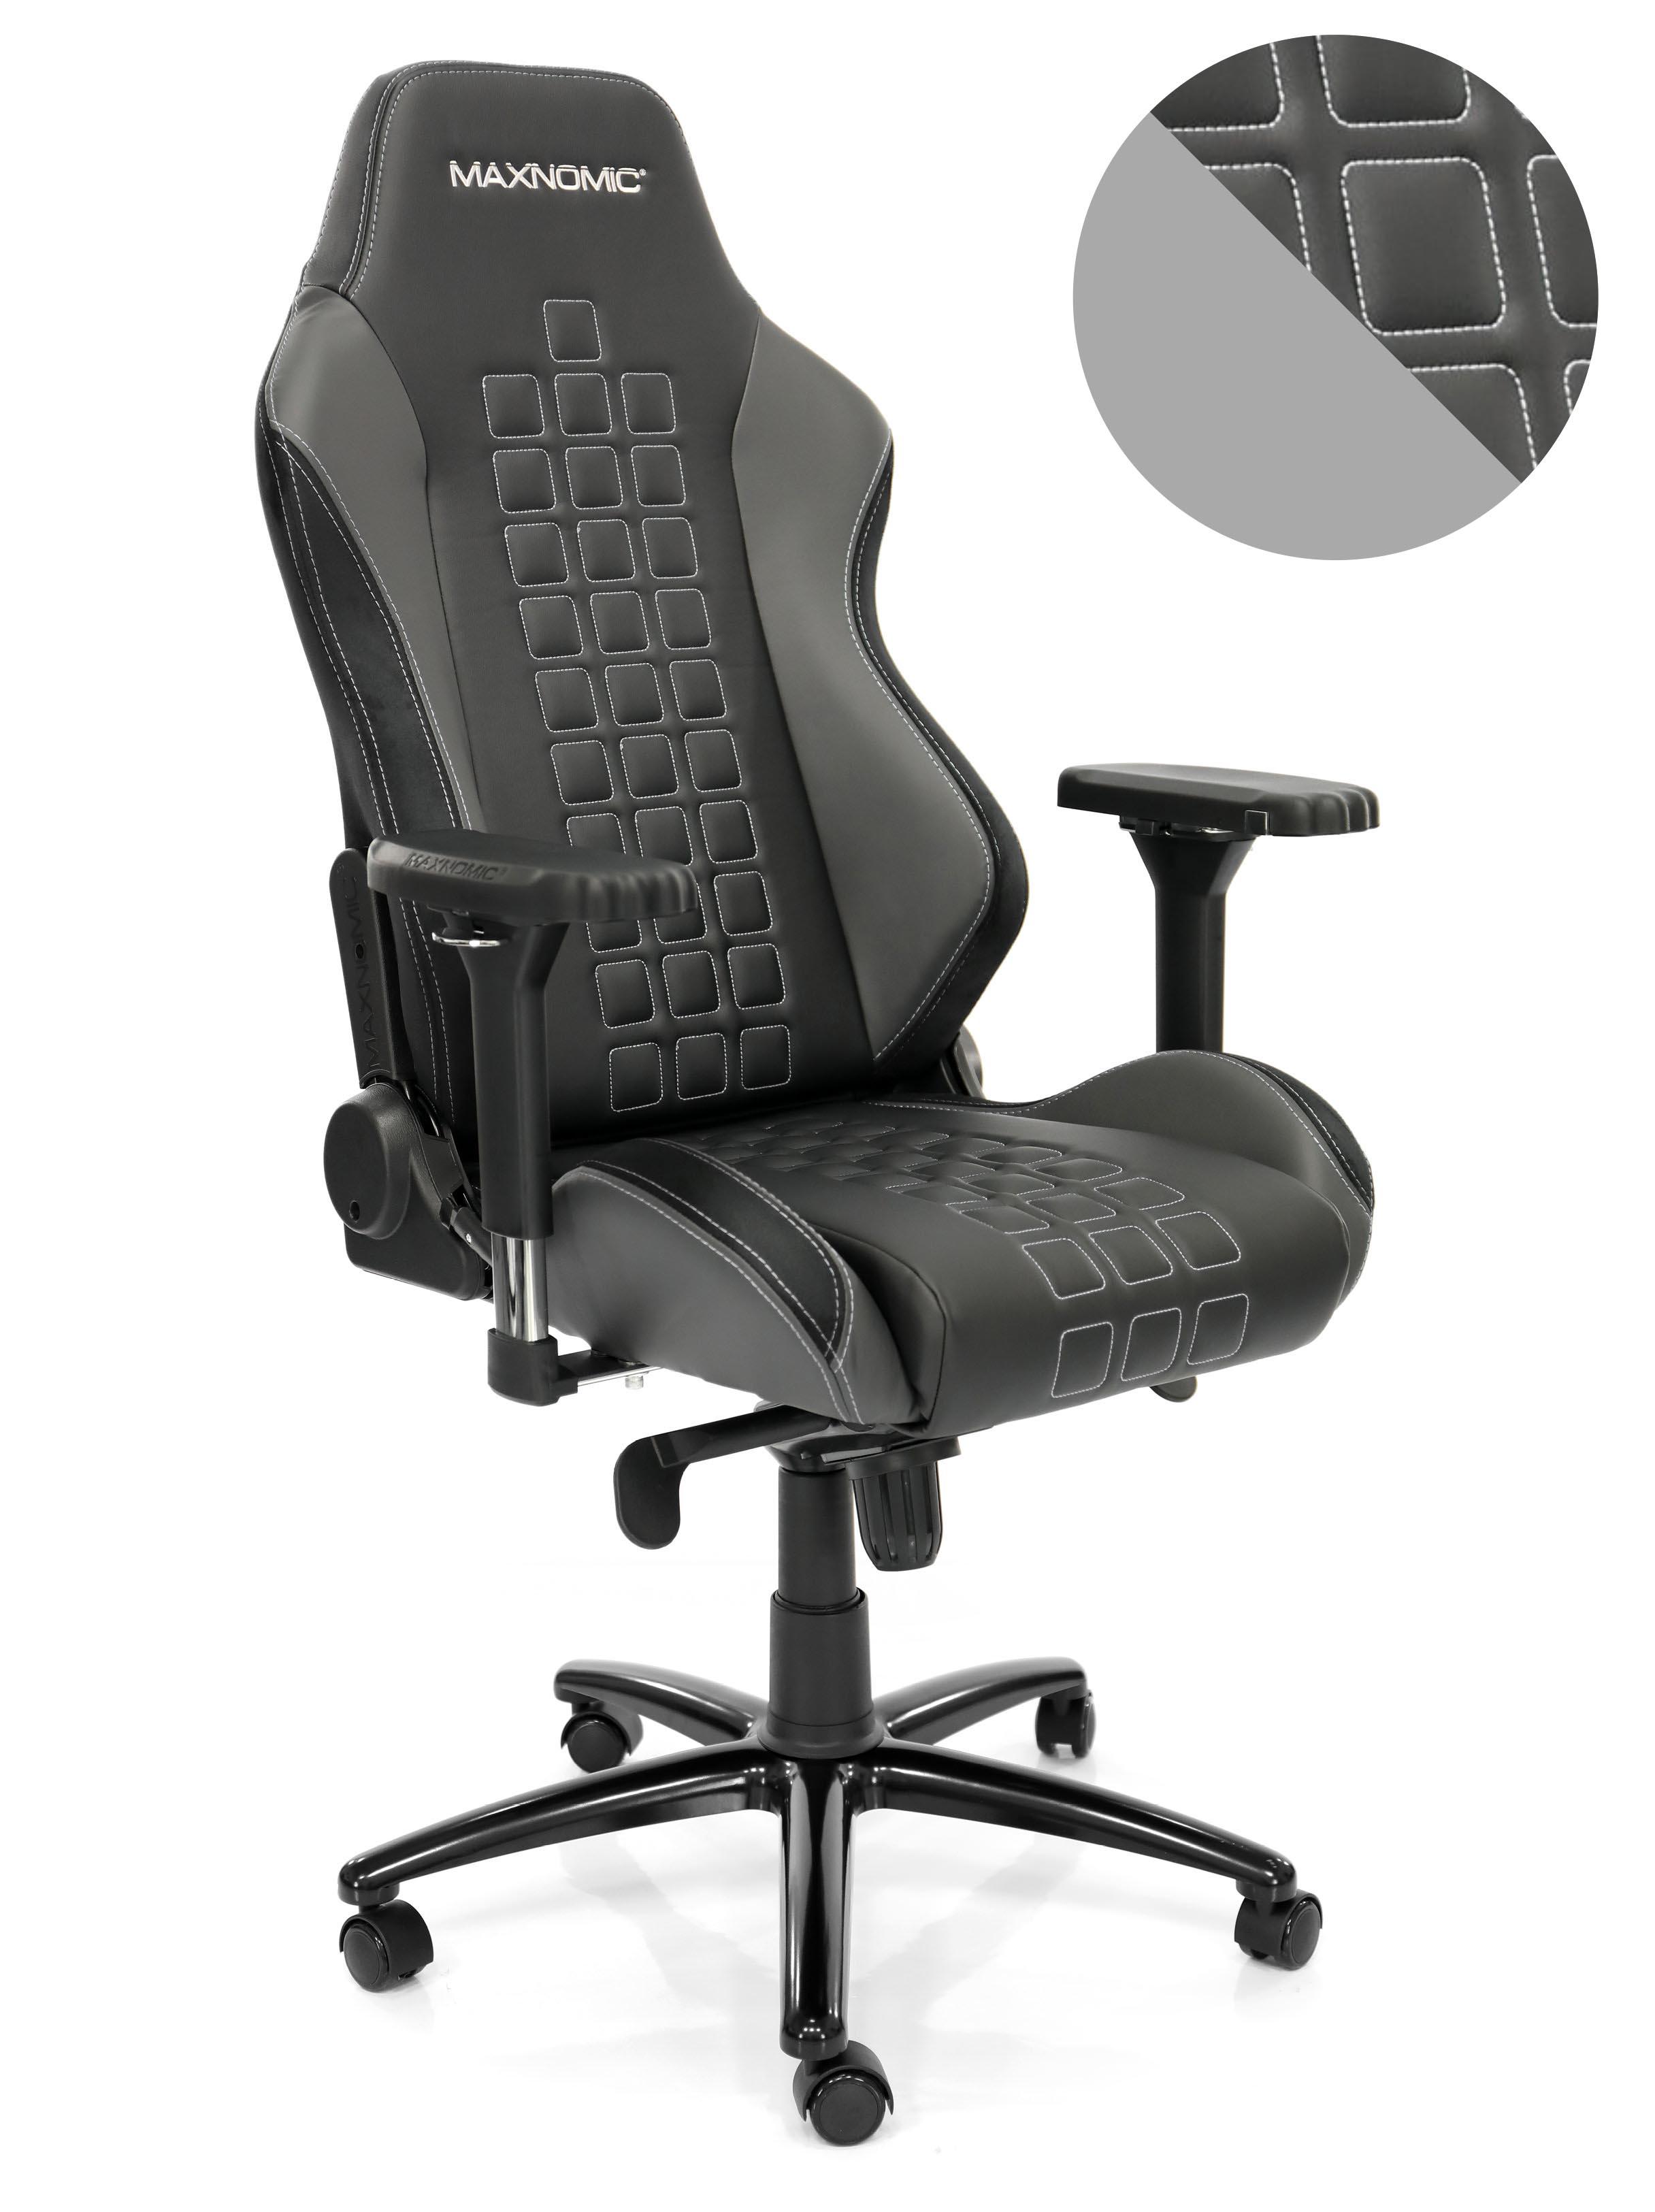 » Maxnomic - QUADCEPTOR PRO (Mein Gaming Stuhl)